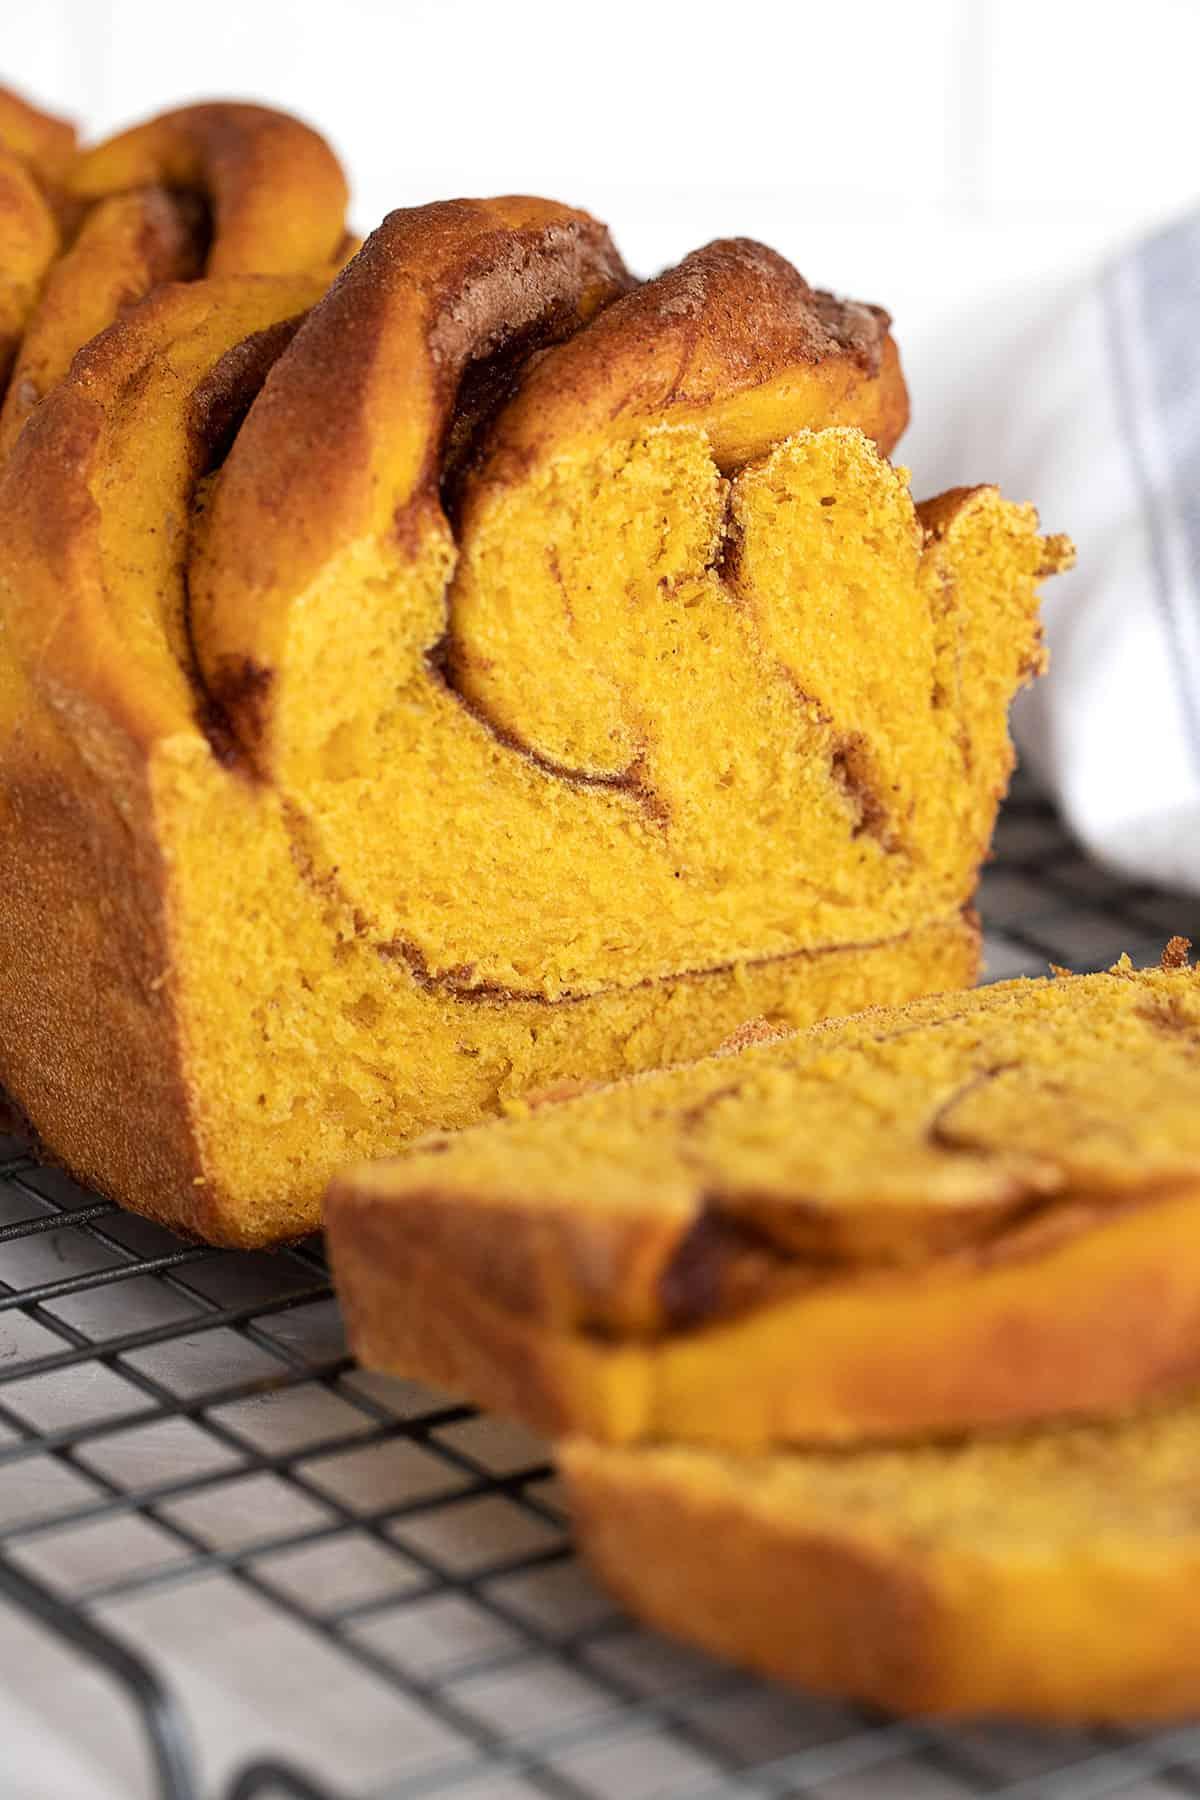 pumpkin cinnamon swirl yeast bread on cooling rack sliced